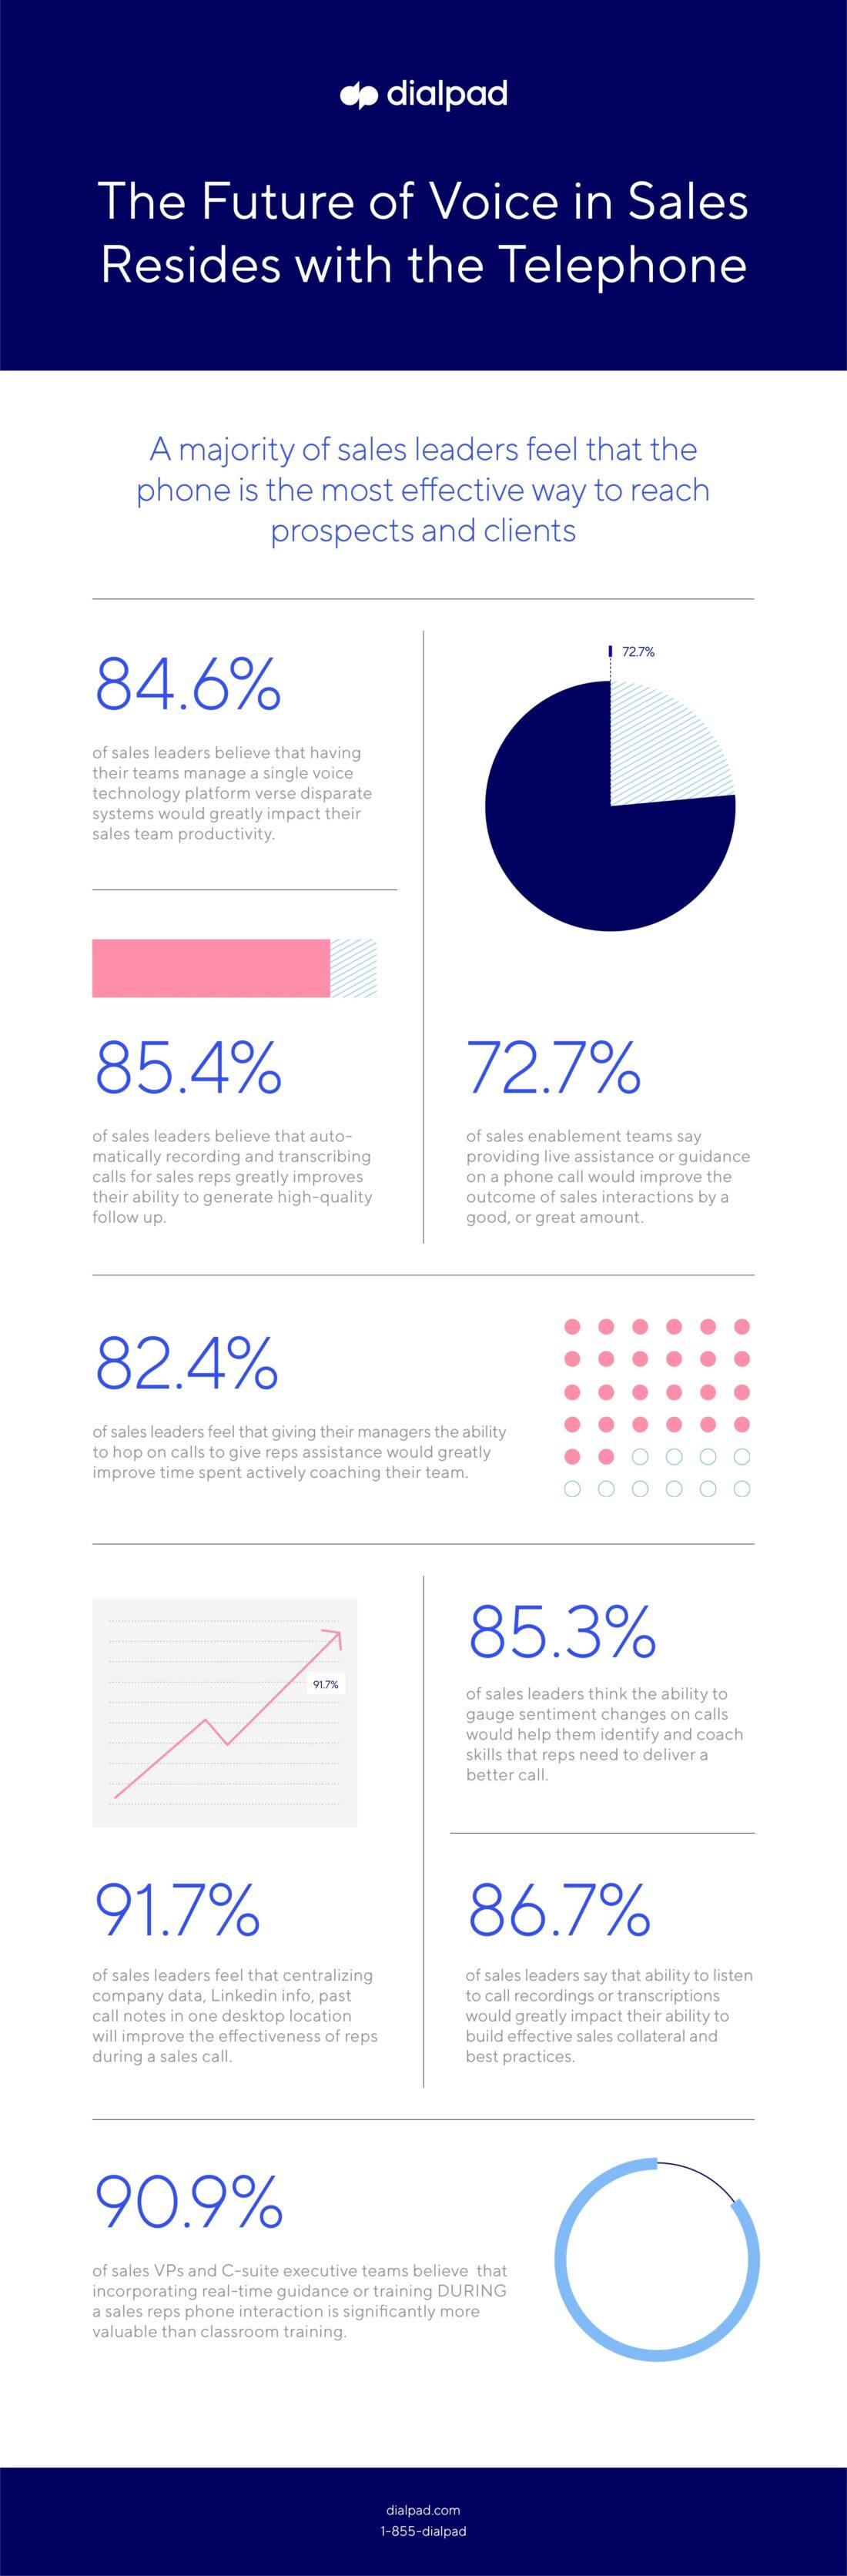 Deloitte Infographic